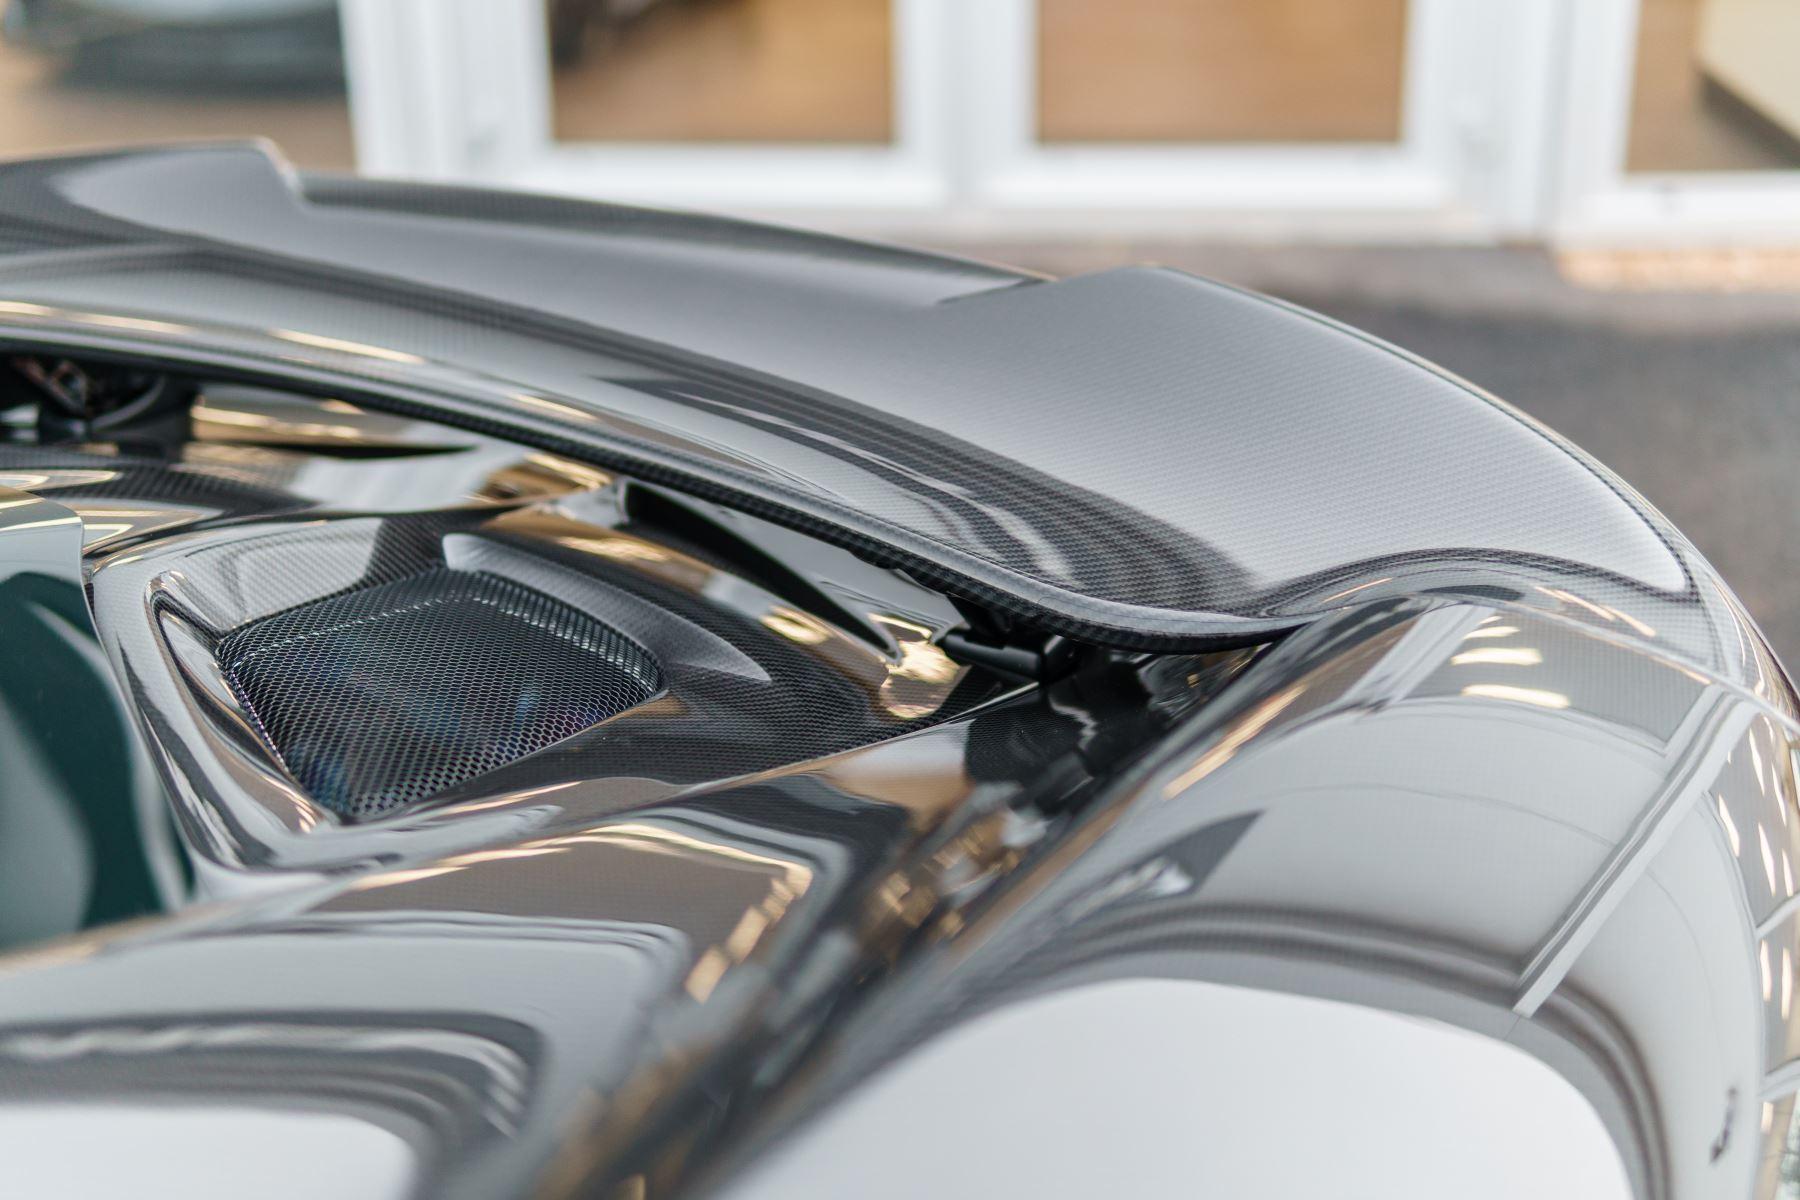 McLaren 675LT Spider MSO Carbon Series image 47